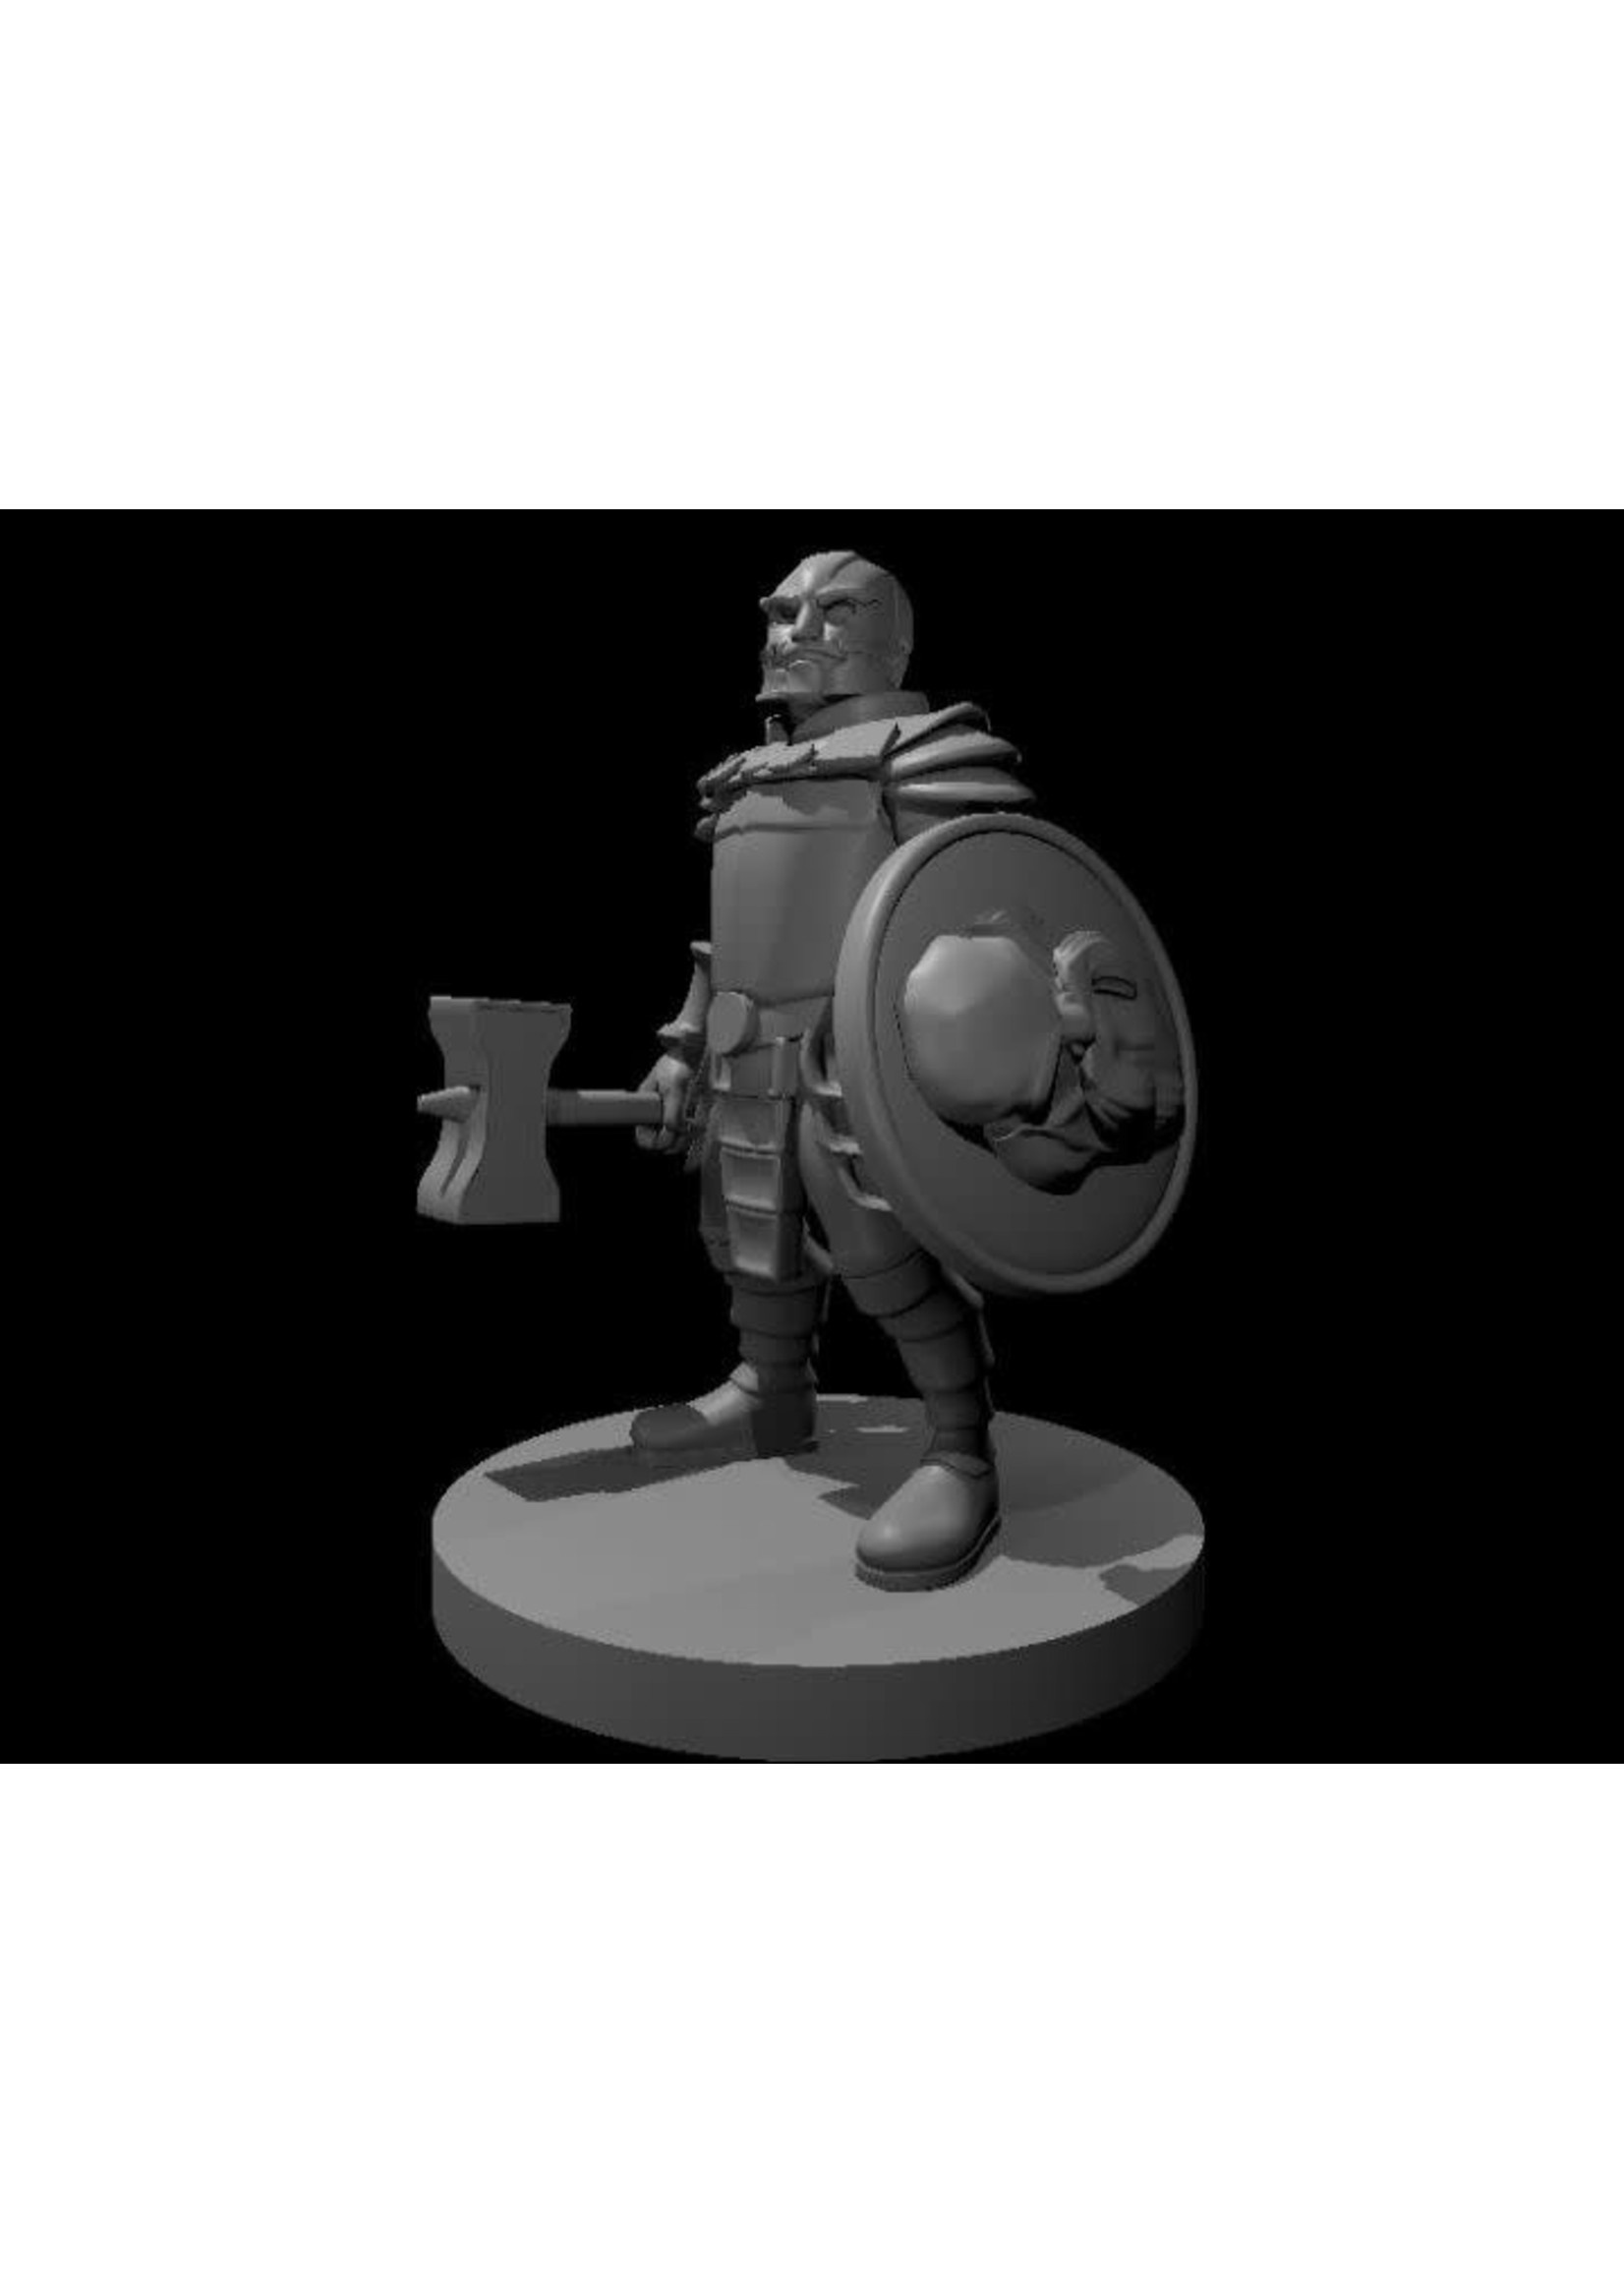 Animated Dwarven Armor (Patreon Mz4250)